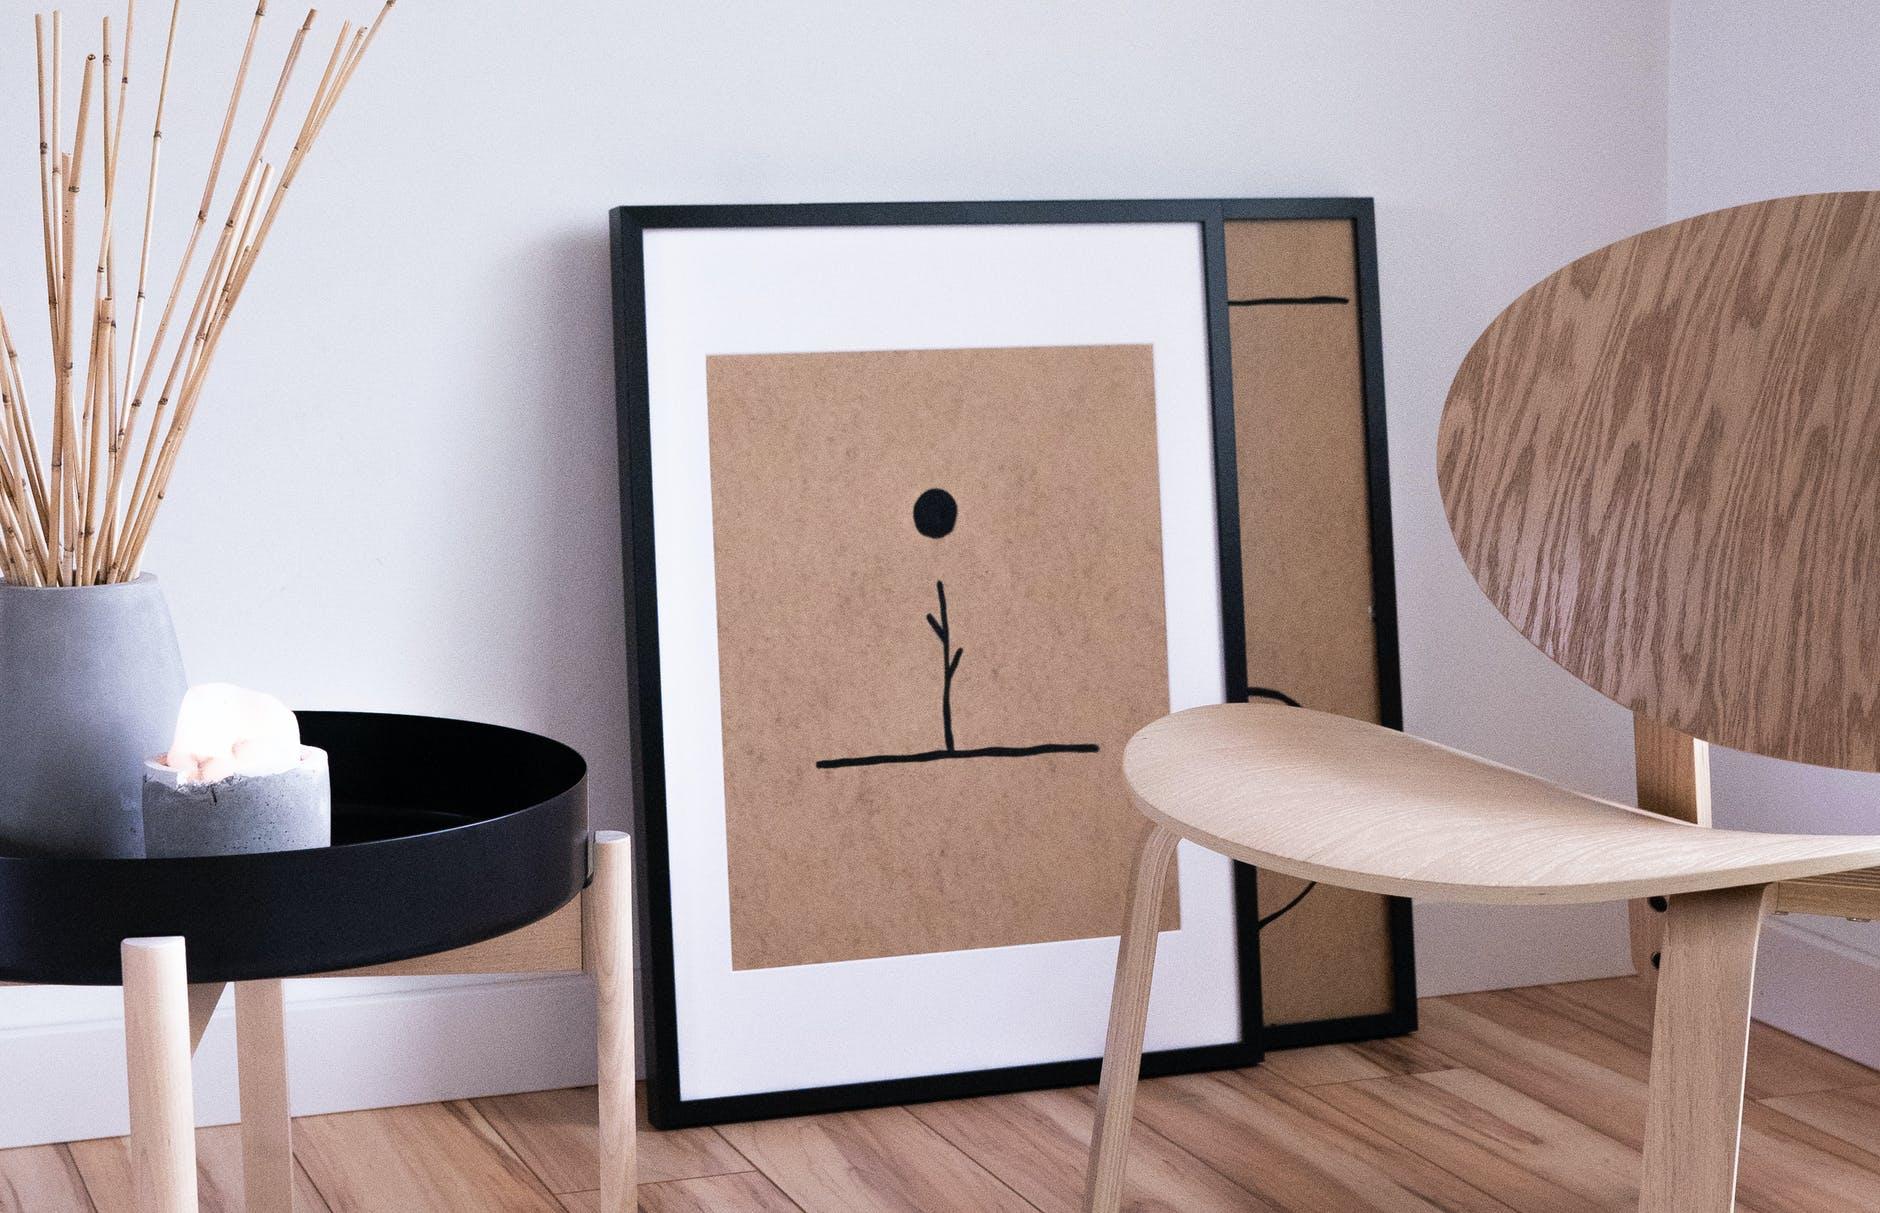 frames on brown wooden floor